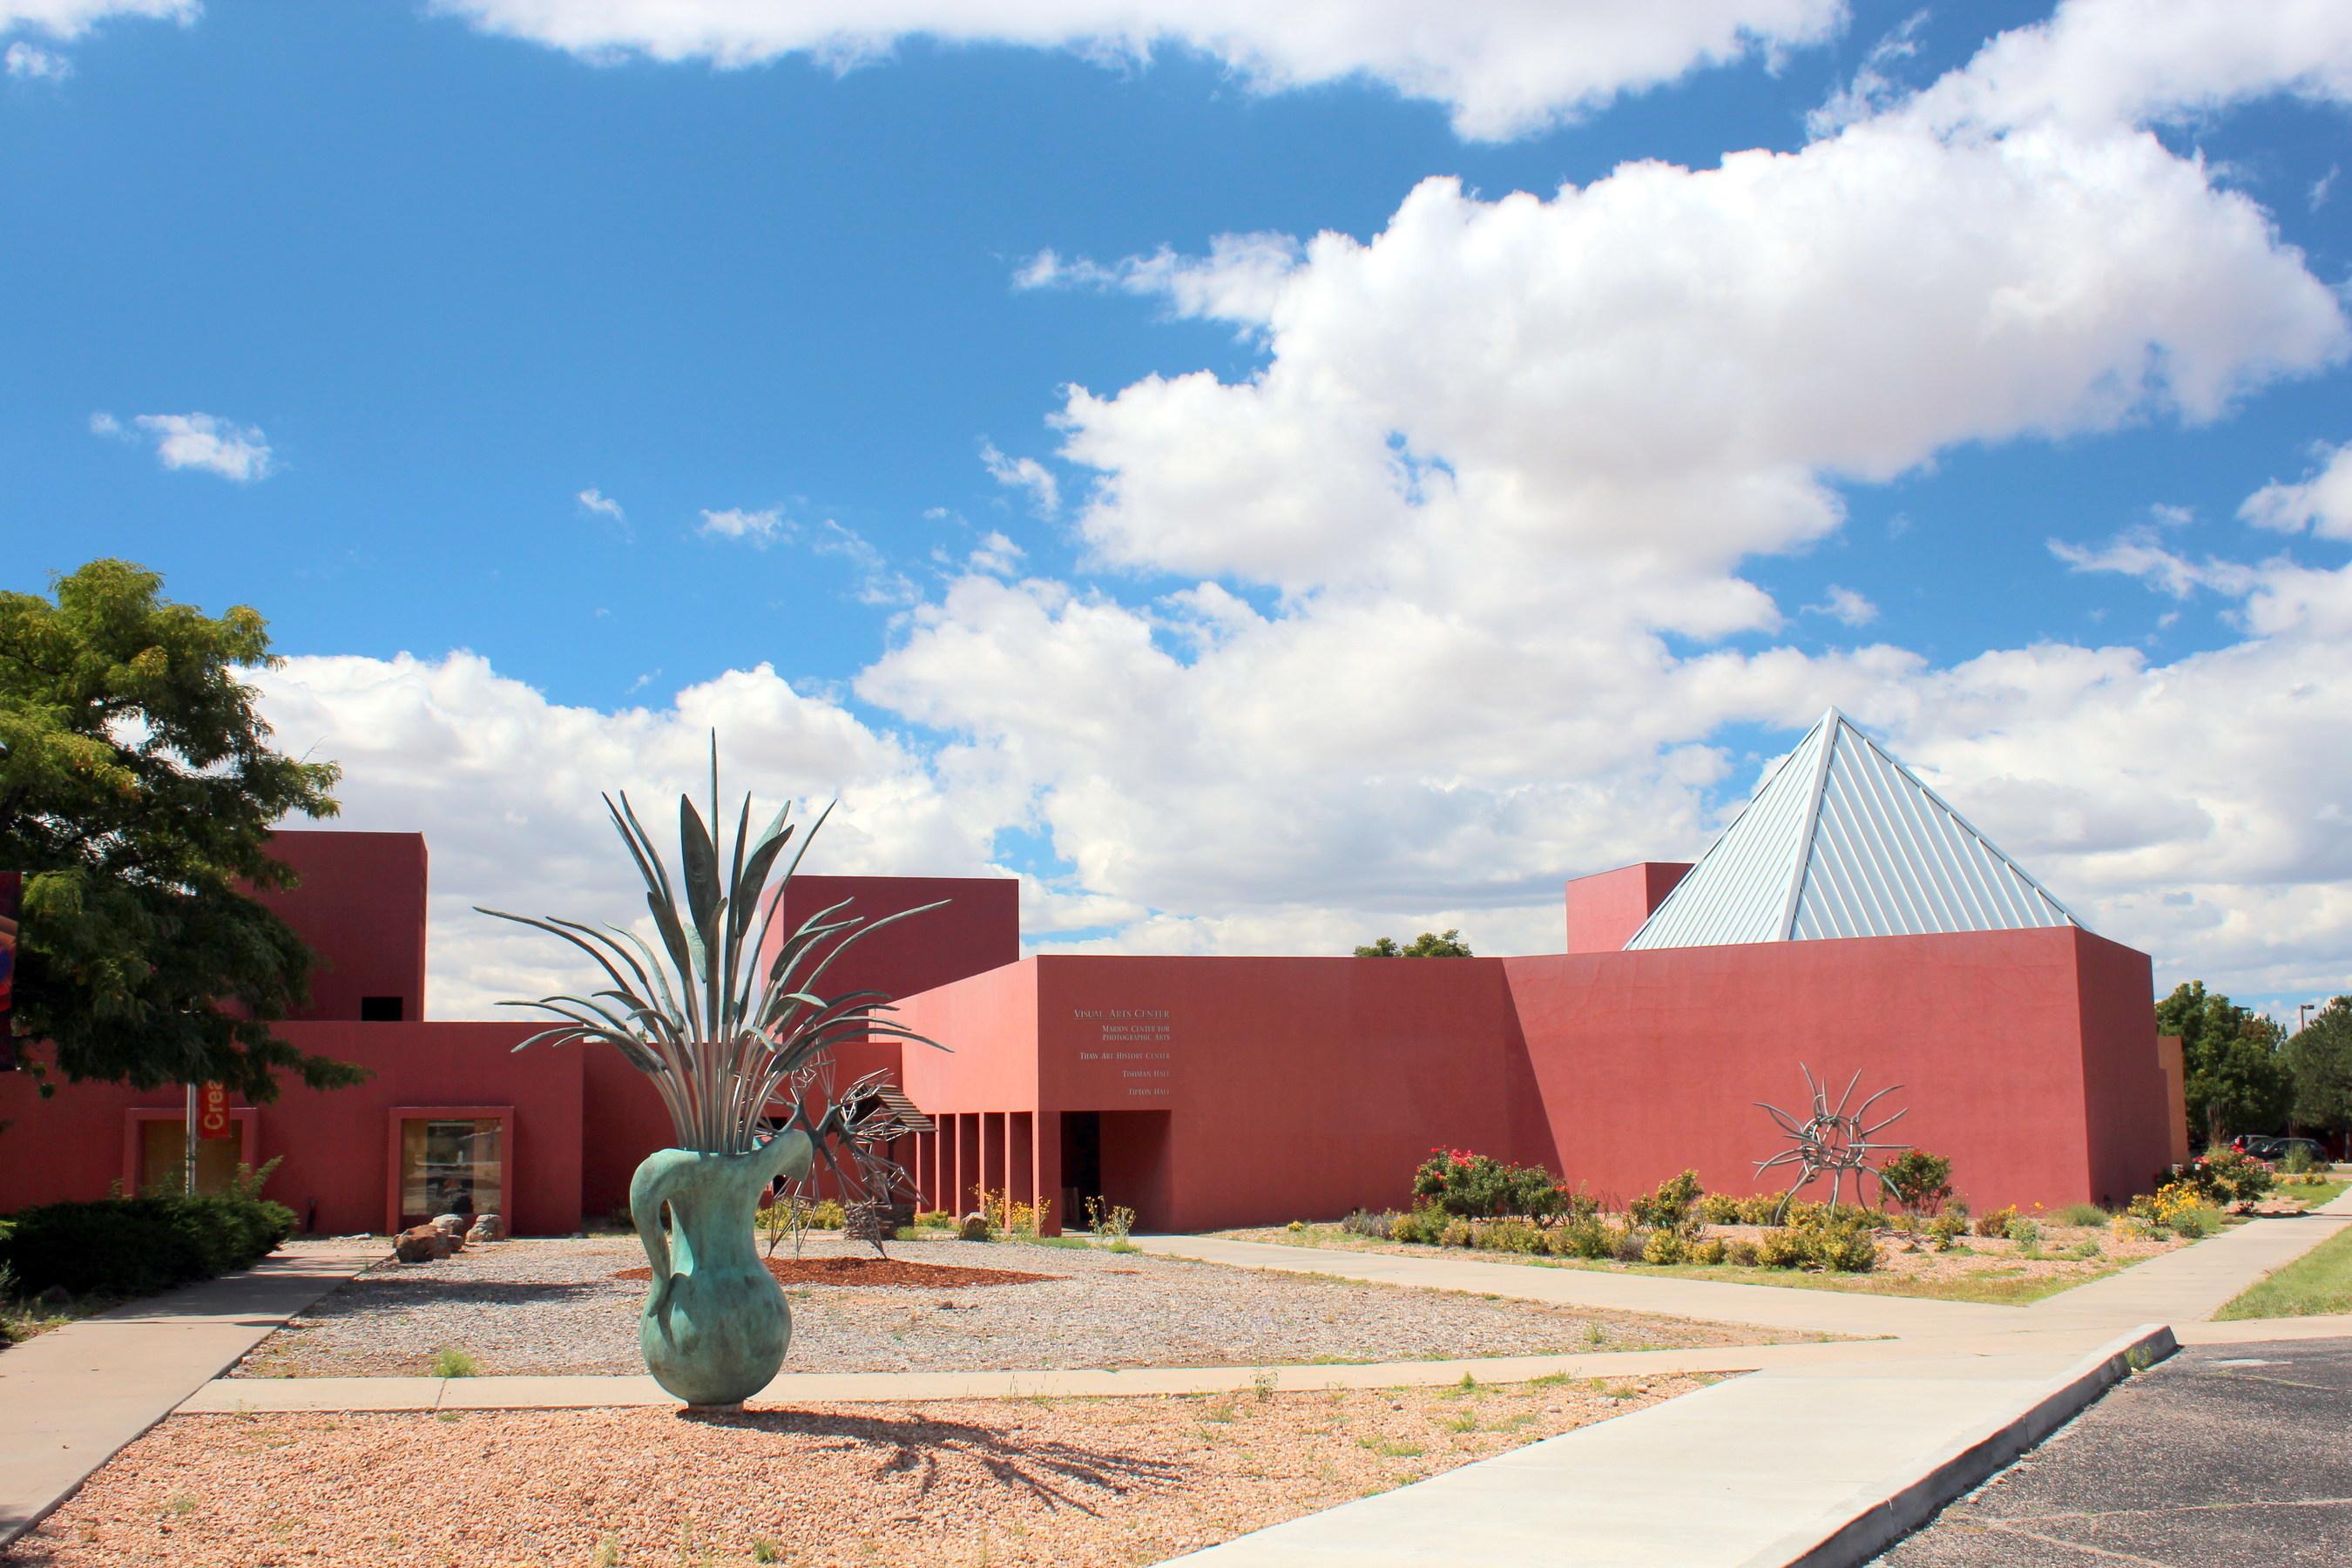 Variety Magazine Names Santa Fe University Of Art And Design